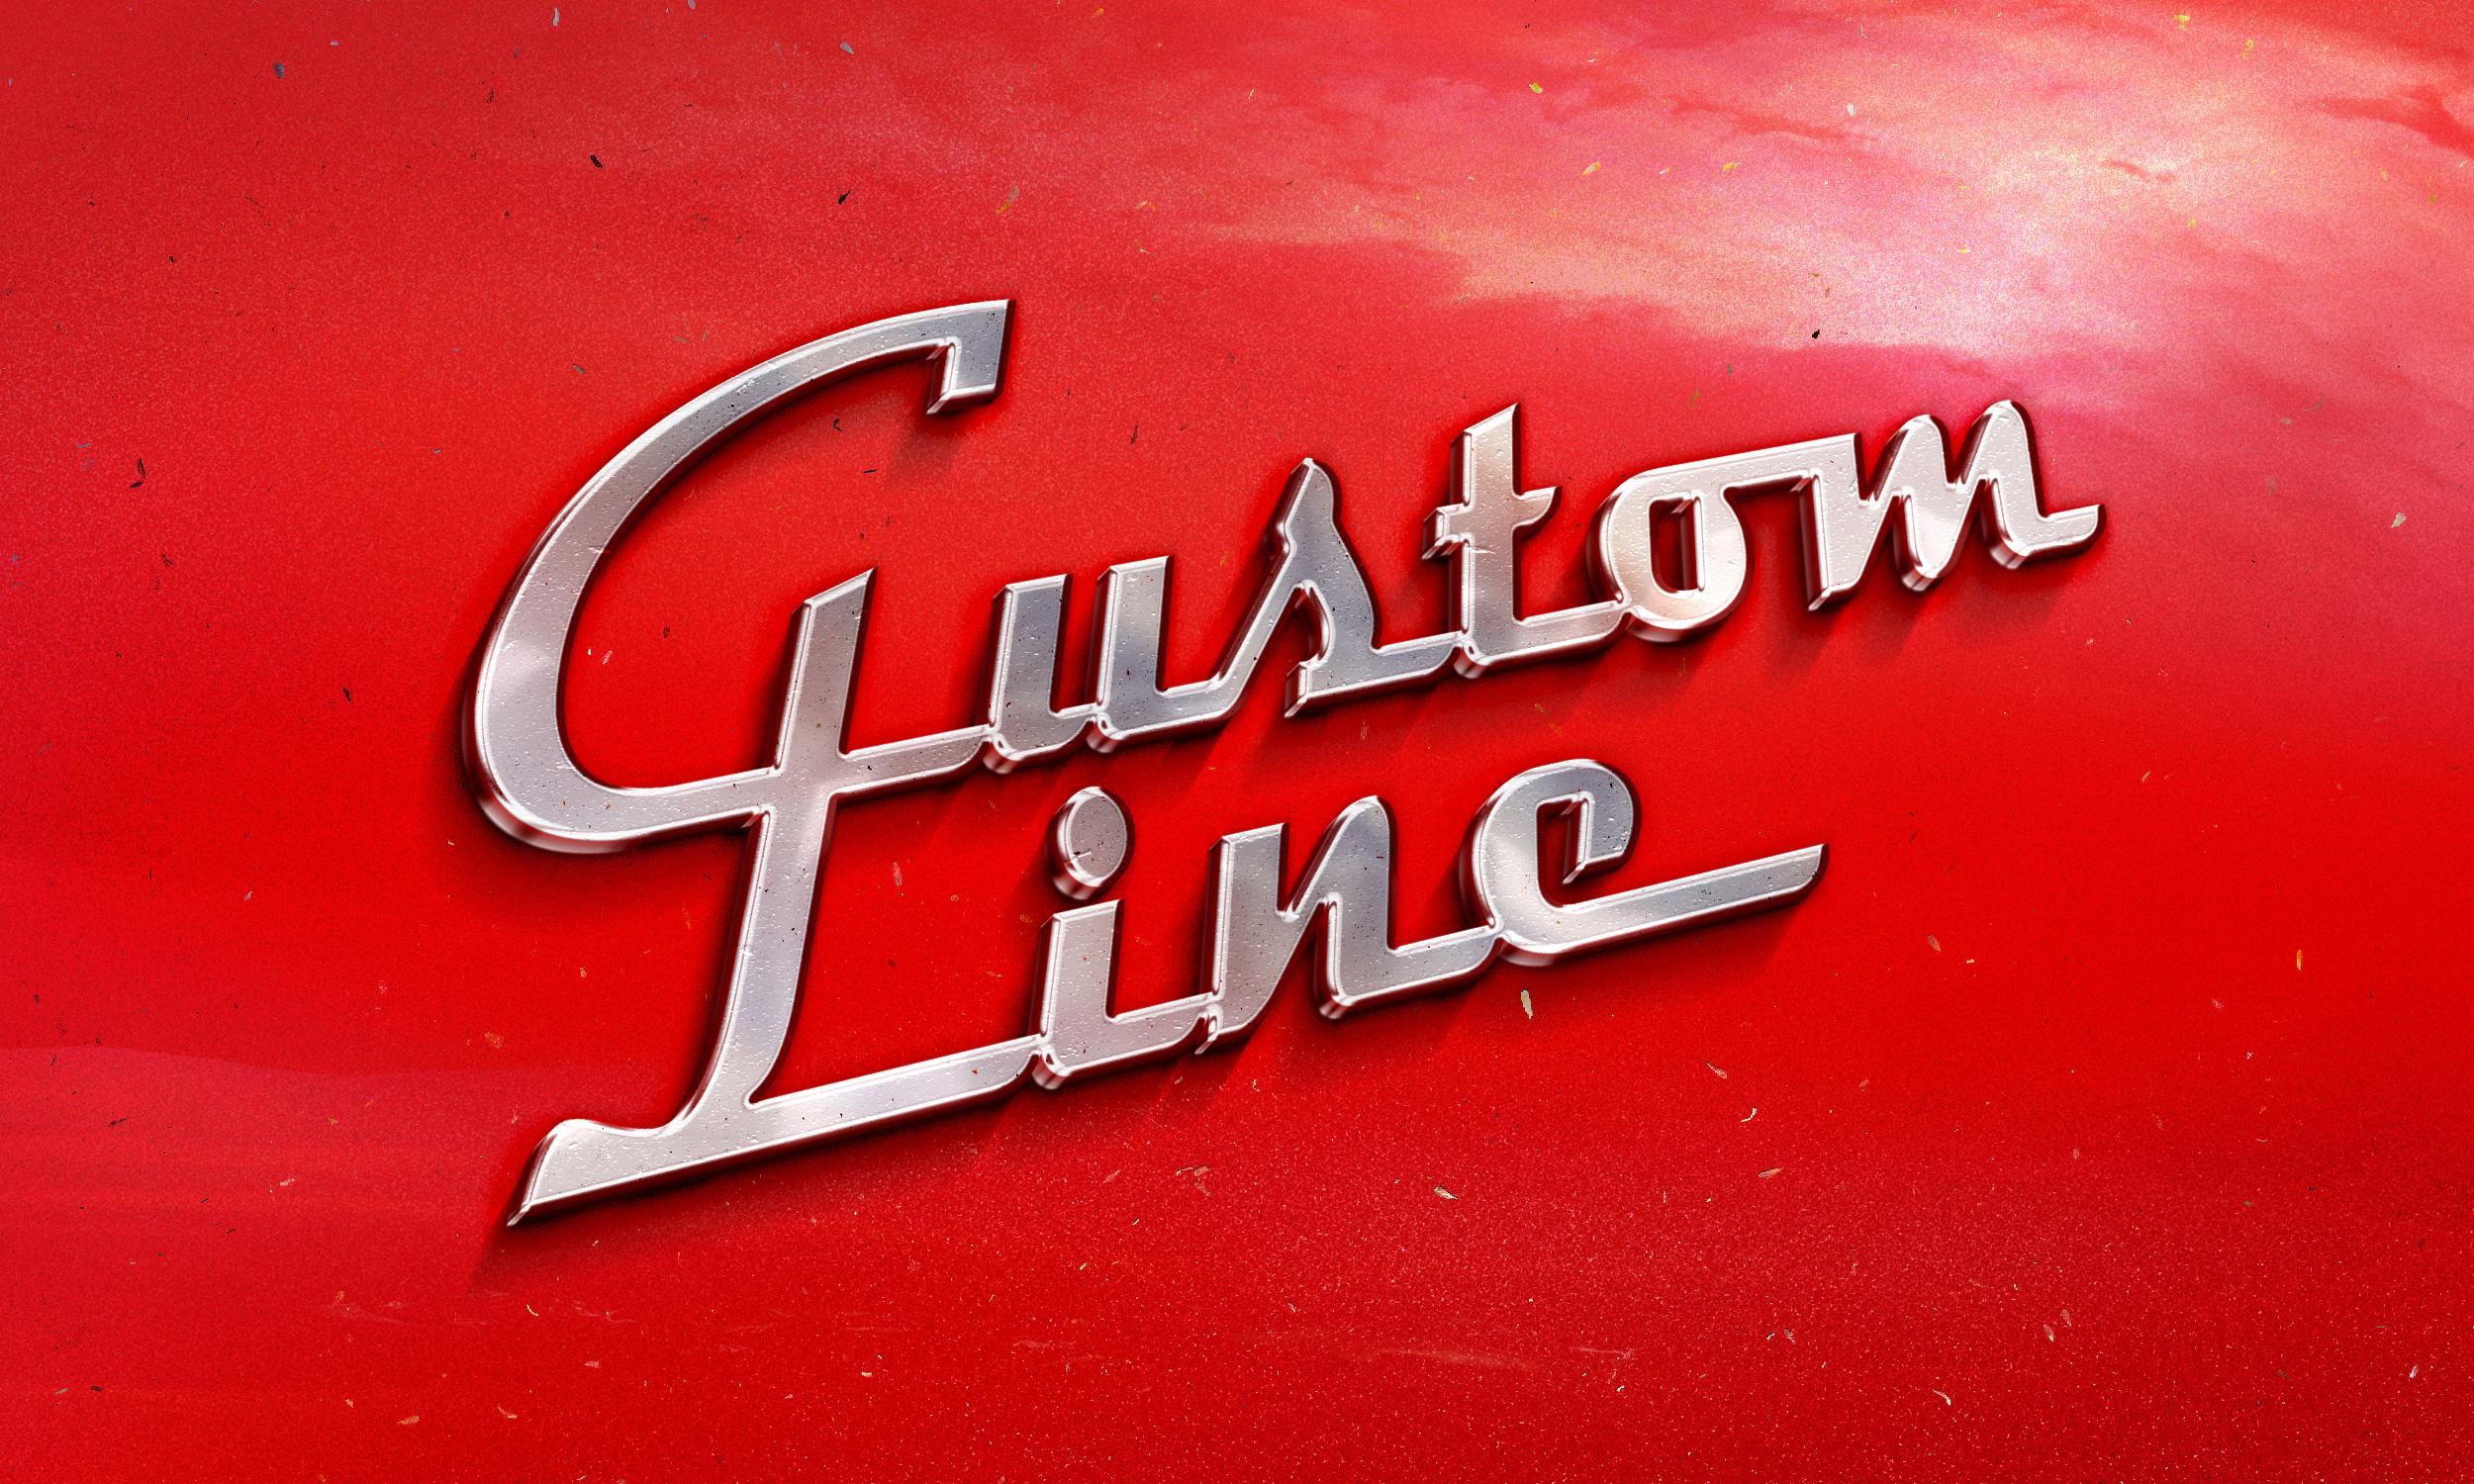 1000+ images about Vintage Car Badging on Pinterest ...